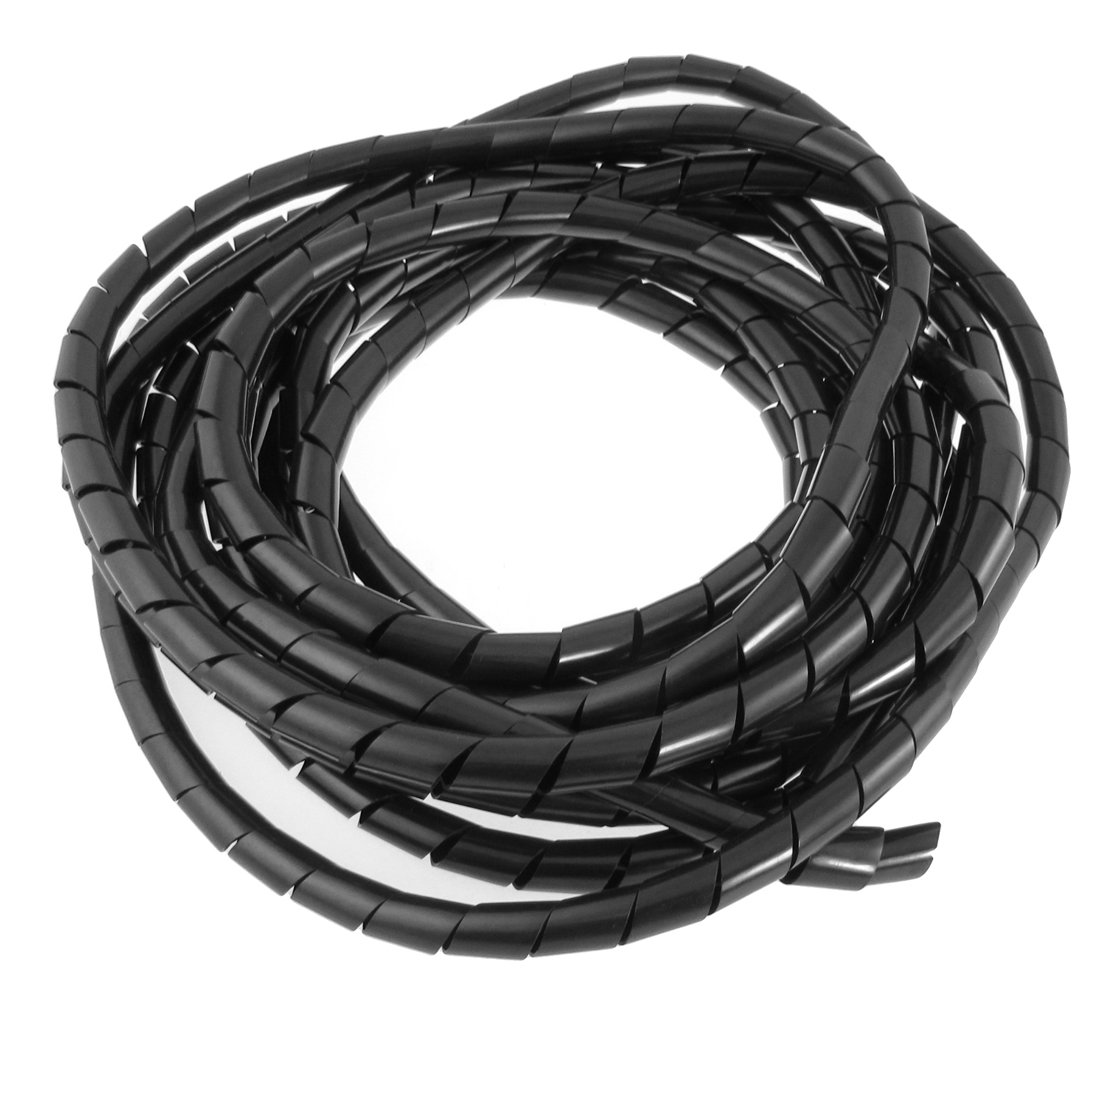 12mm Ouide Dia 22 Ft Flexible Spiral Wire Wrap Desktop PC Manage ...